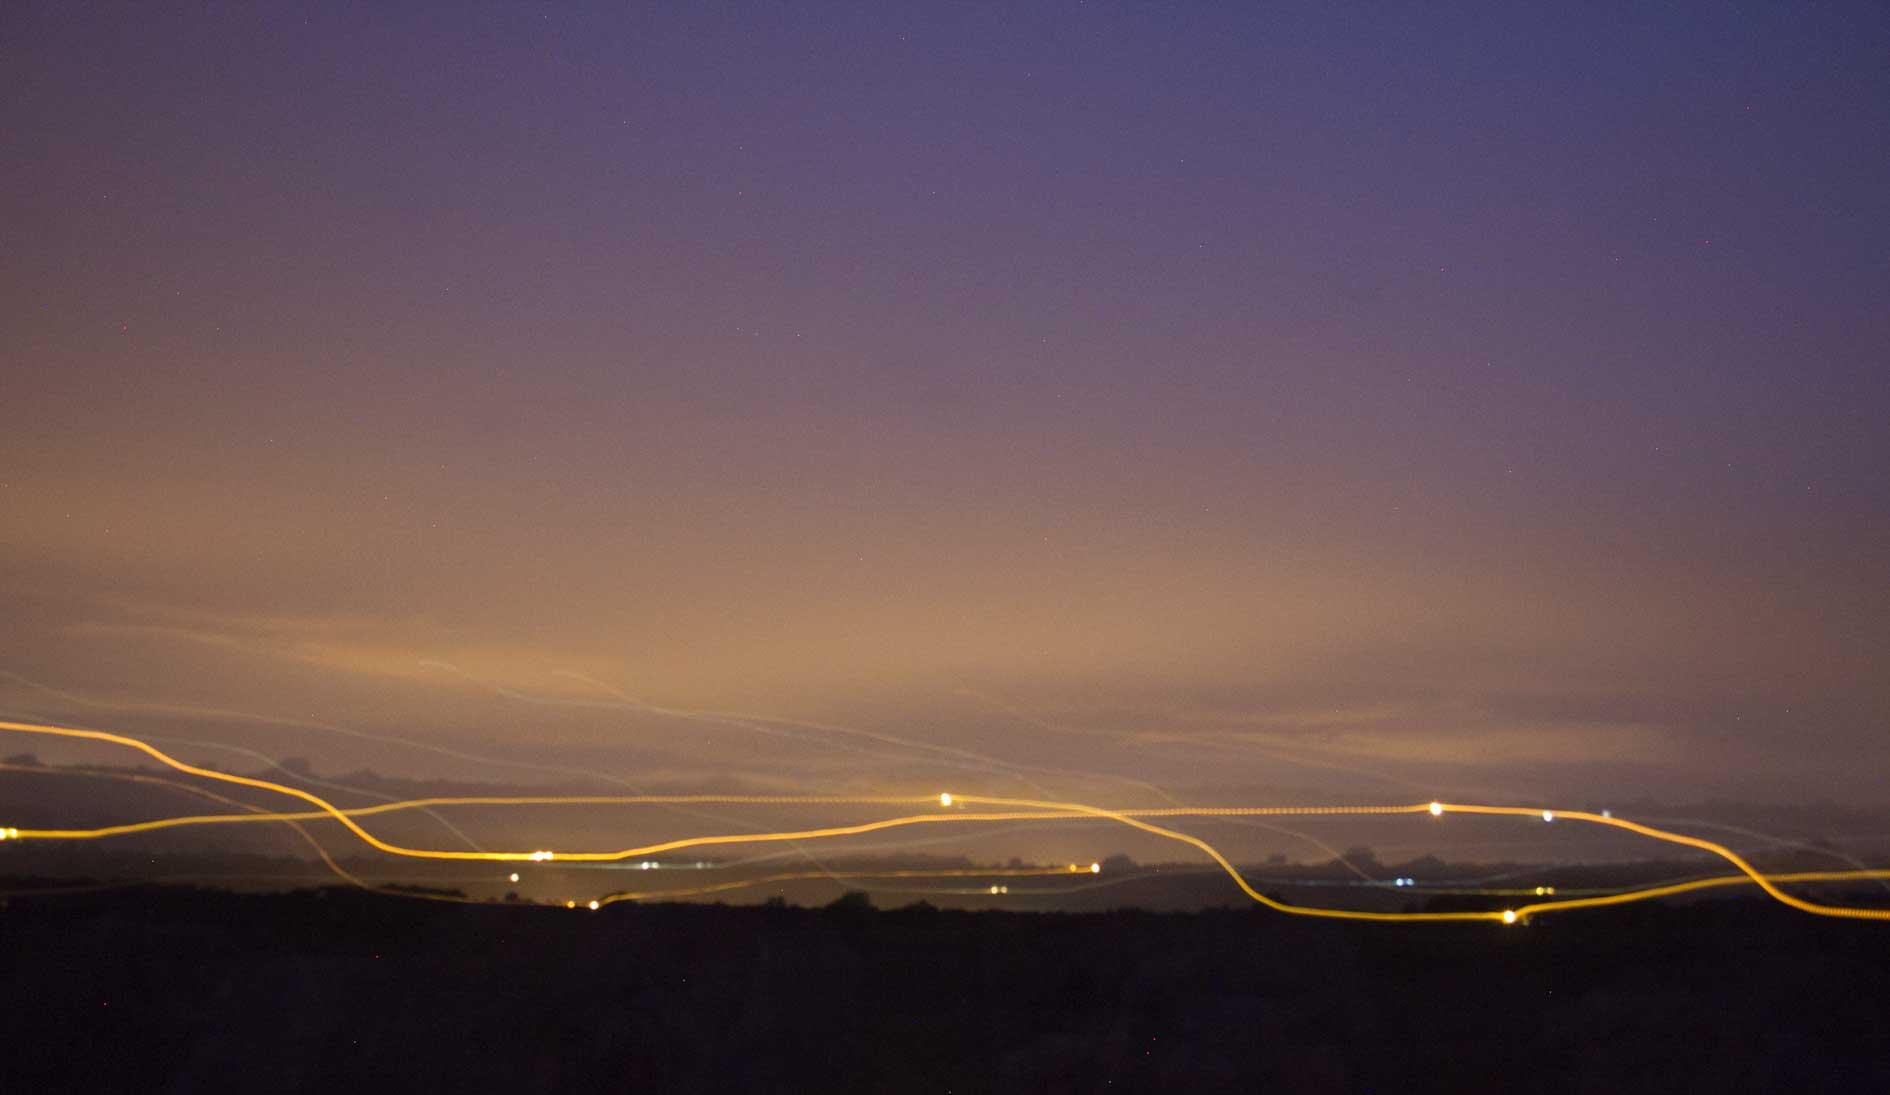 aurora-and-light-painting-13.jpg